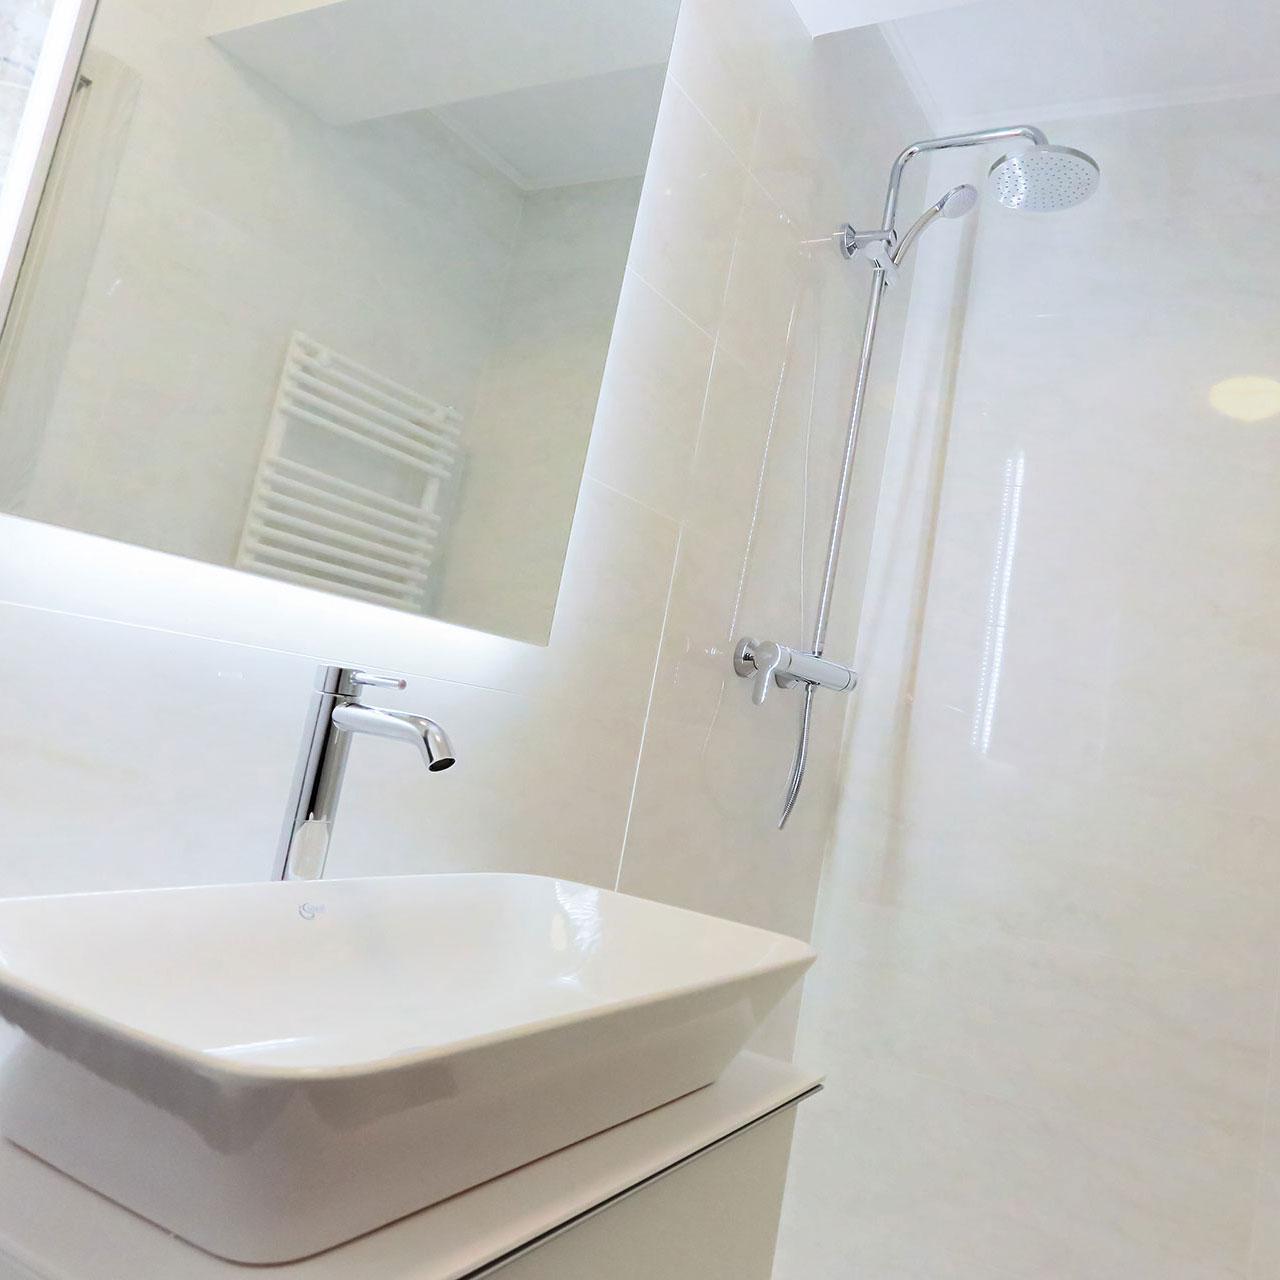 Apartamente de vanzare Bucuresti - Catedral Residence - Marriott, Piata Unirii, 13 Septembrie, Izvor - G4 - 9